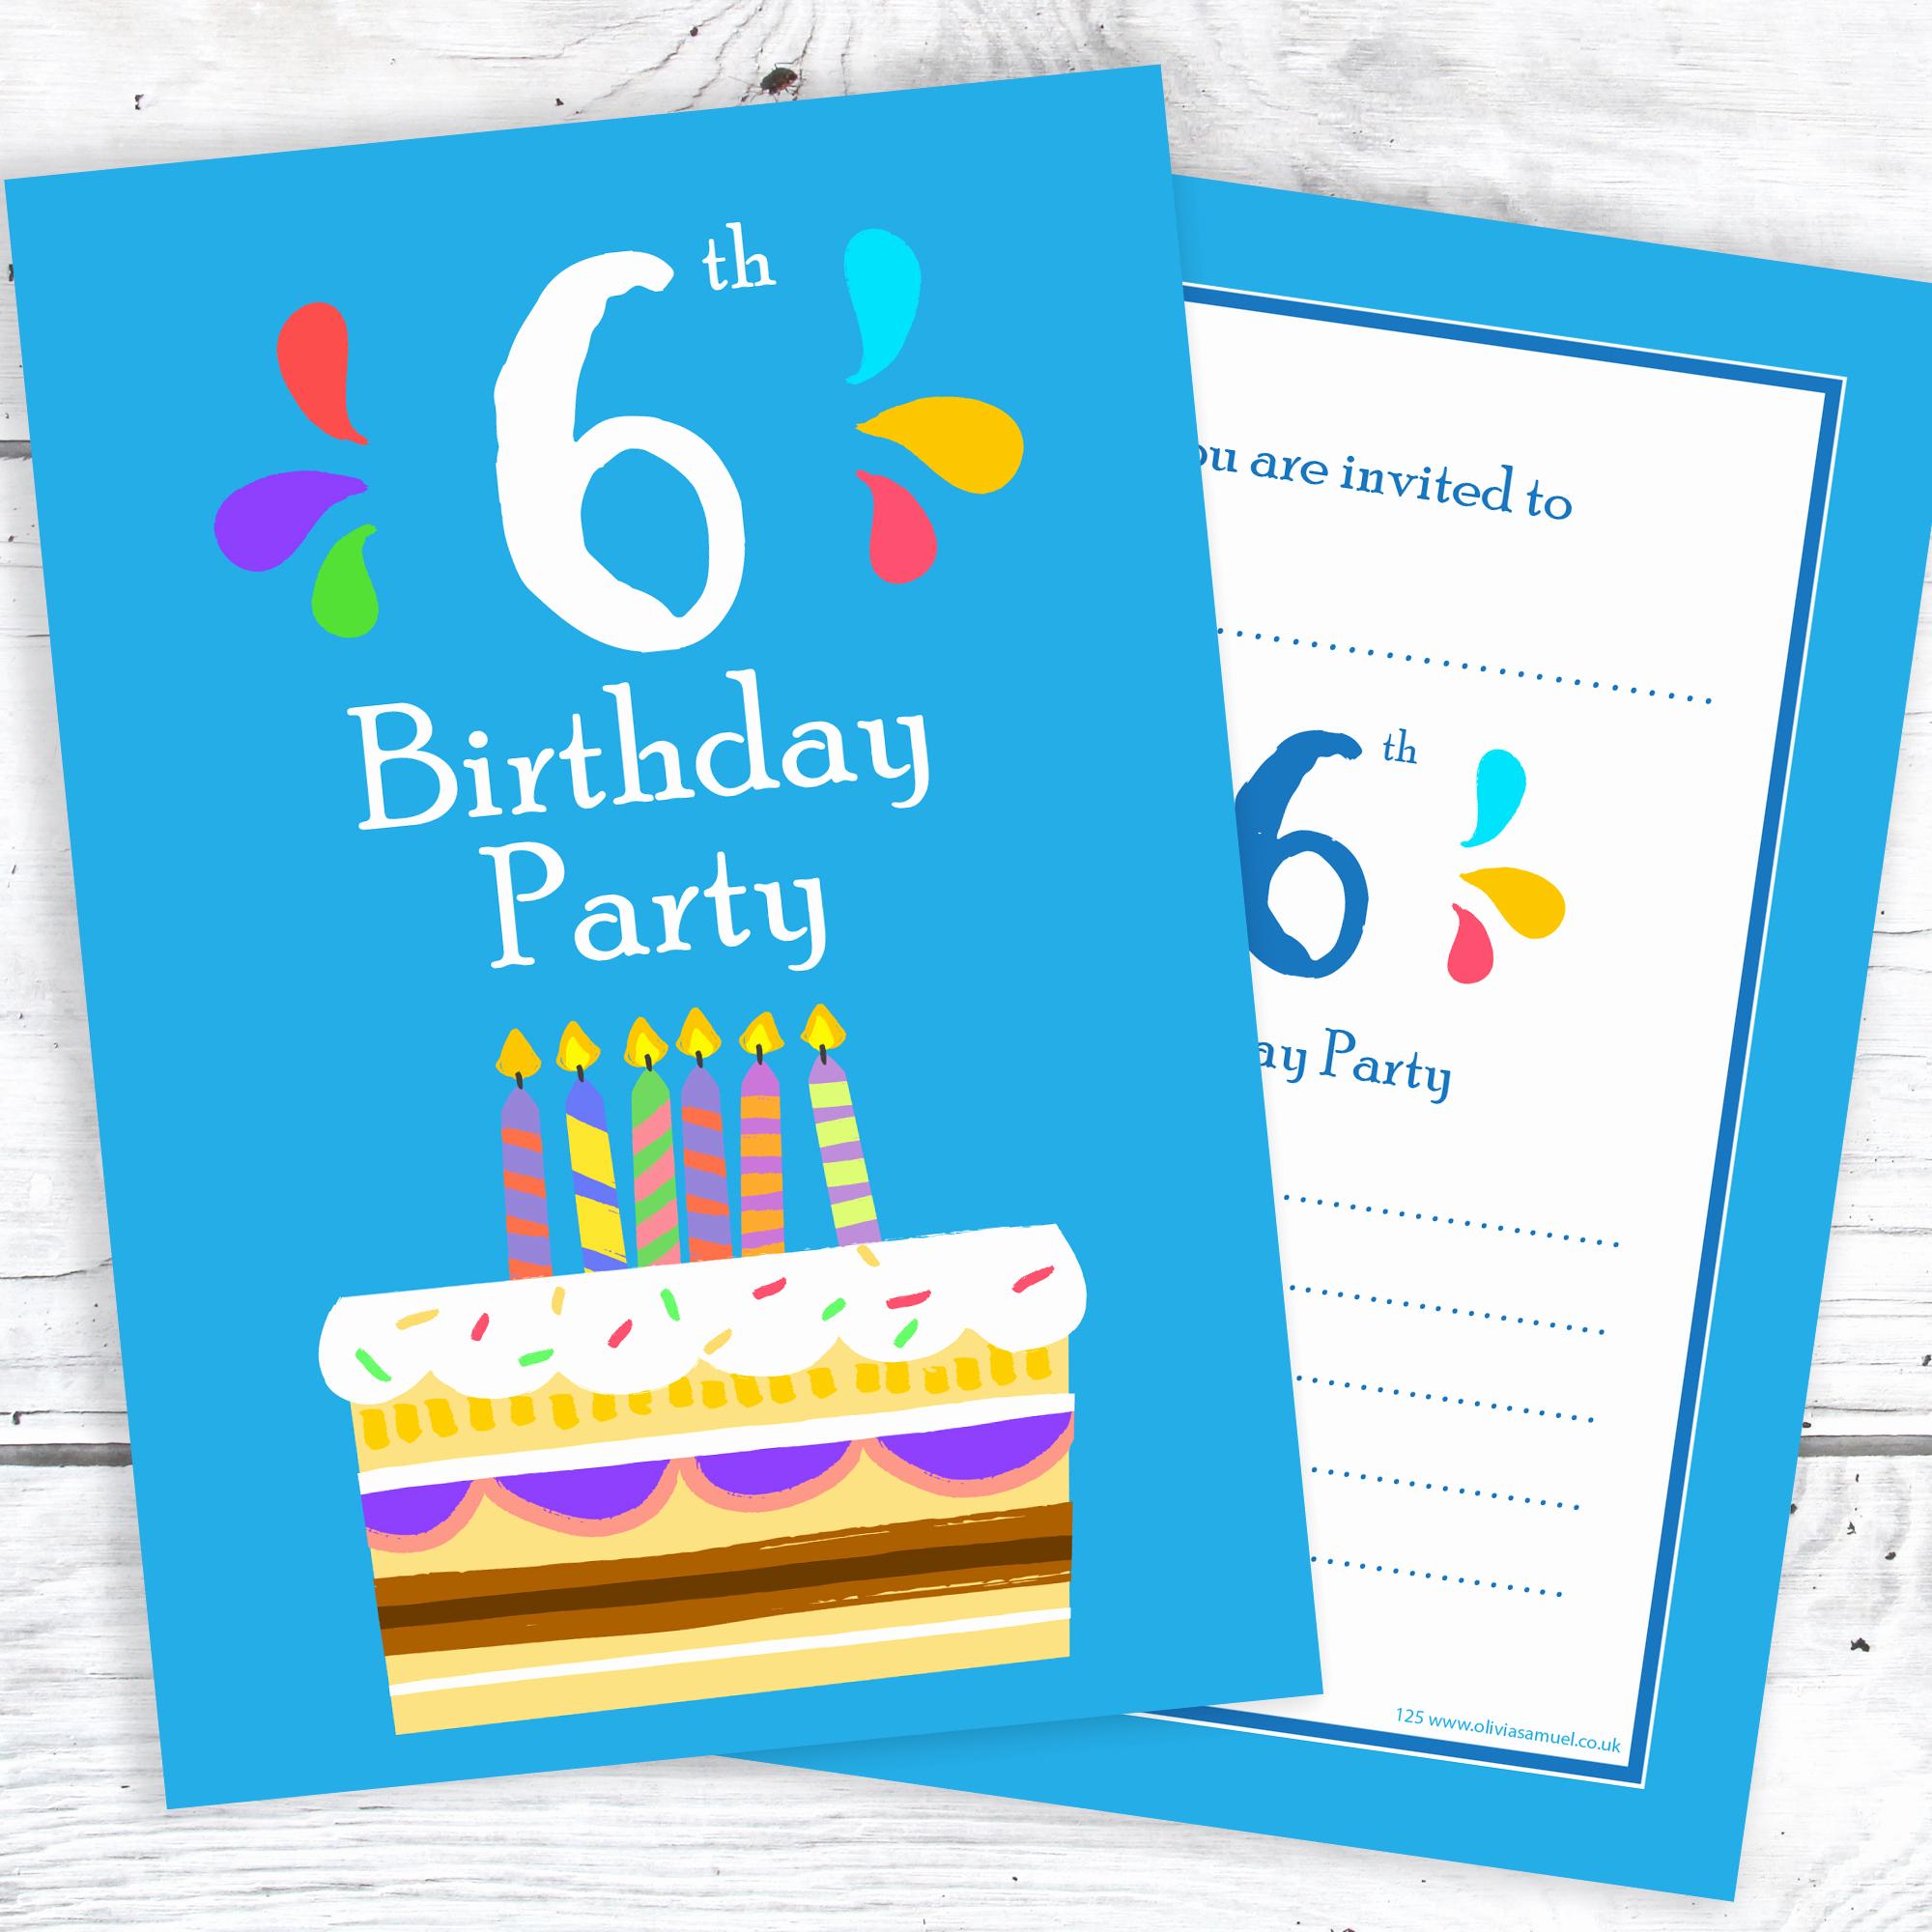 6th Birthday Invitation Wording Fresh 6th Birthday Party Invitations – 6 Candle Blue Cake Design